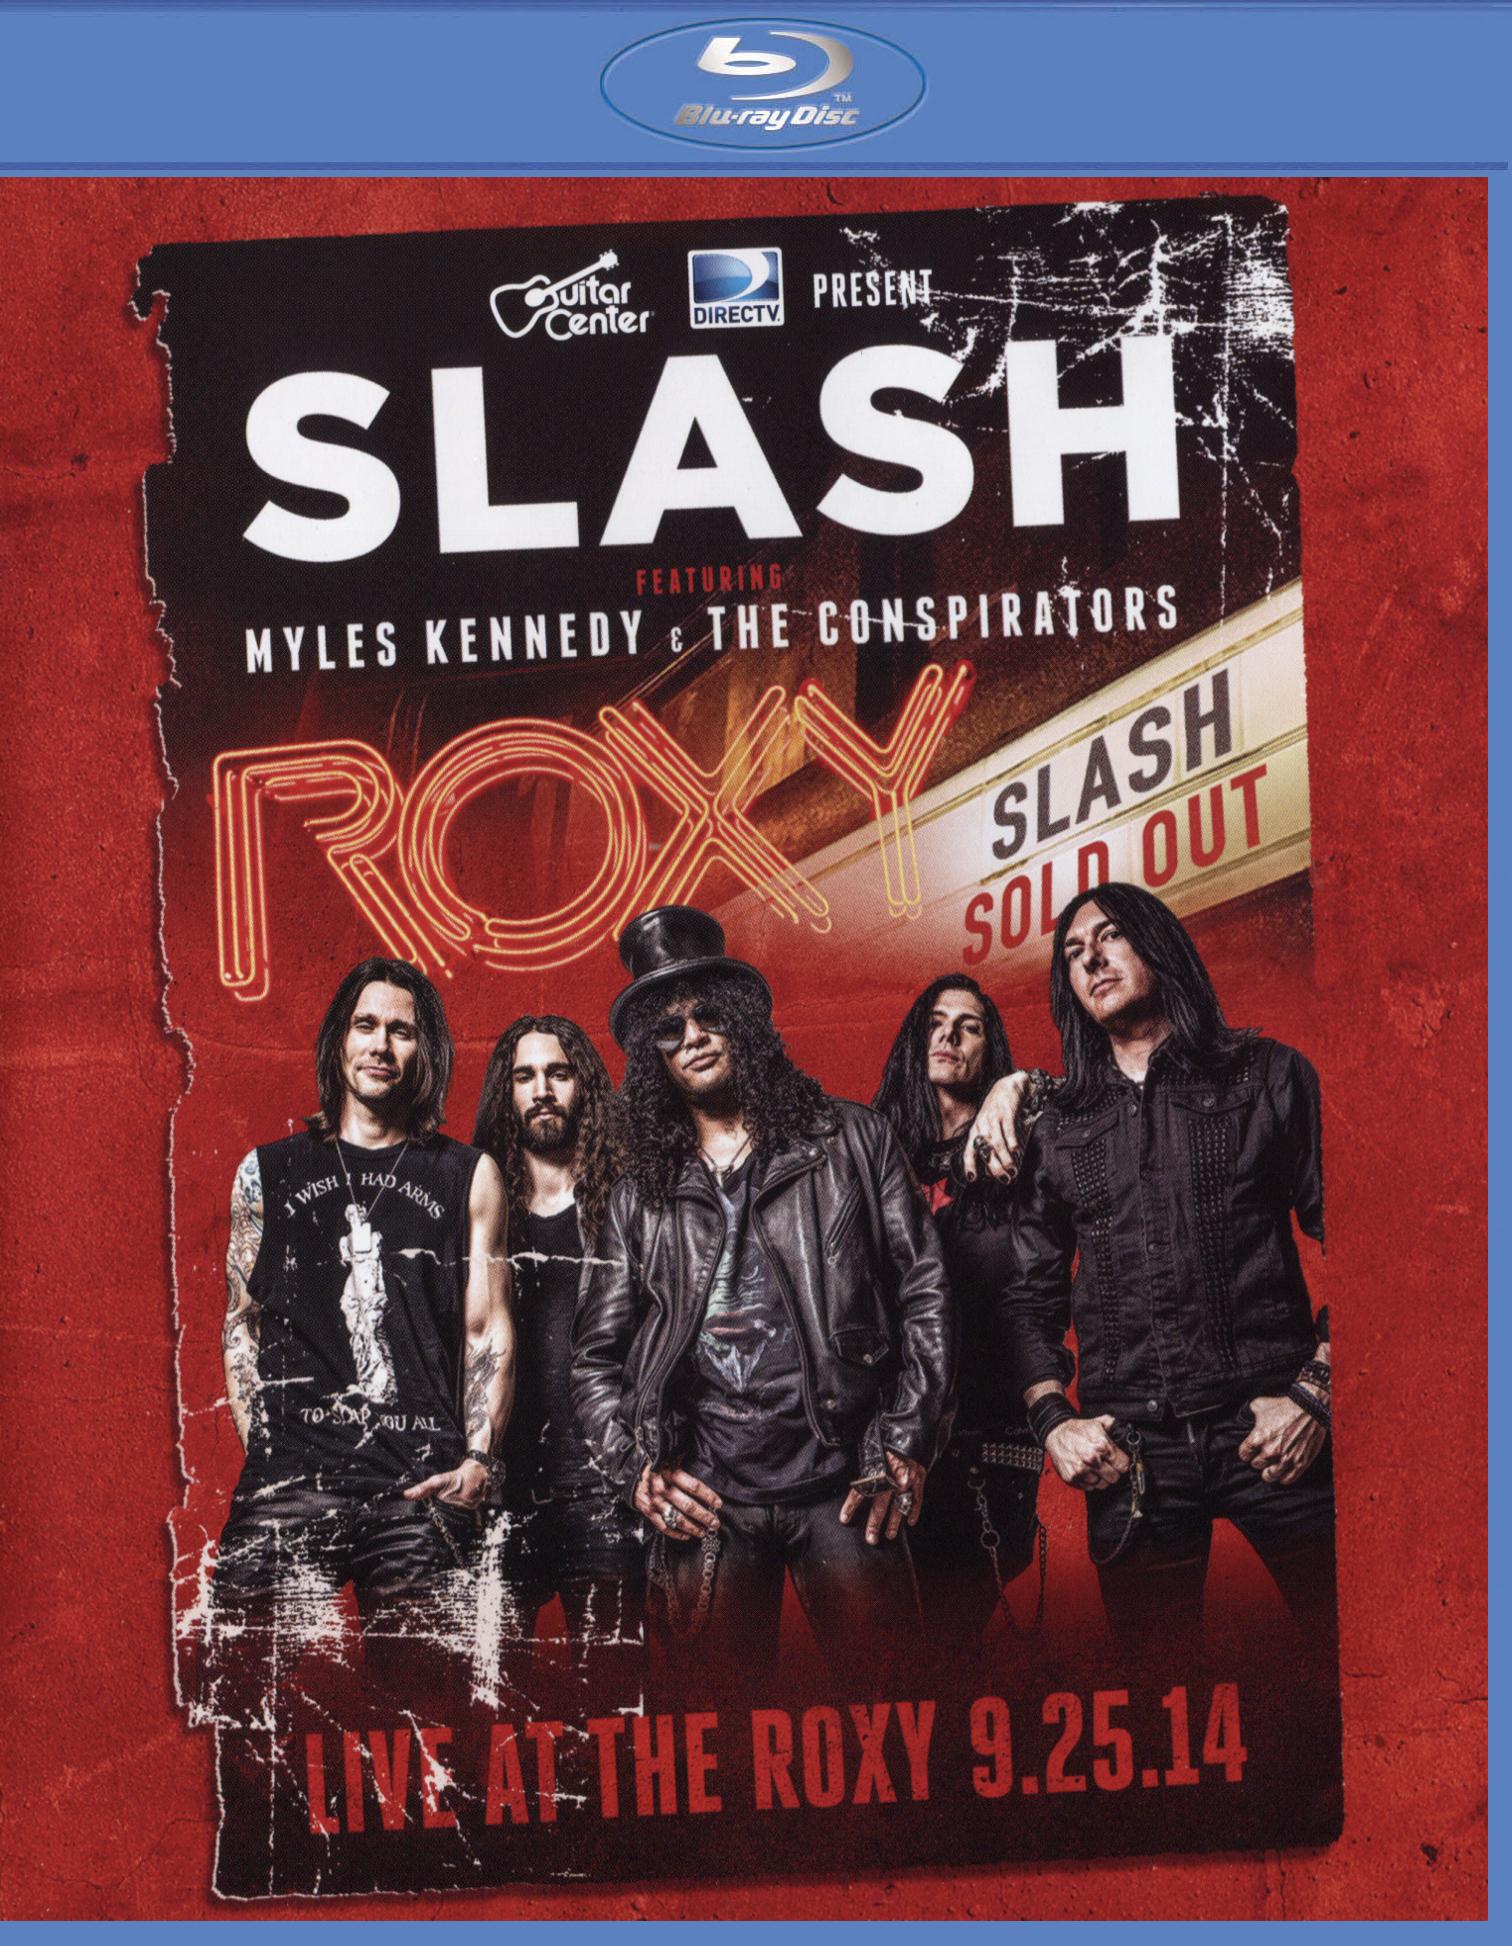 Slash: Live at the Roxy - 09.25.14